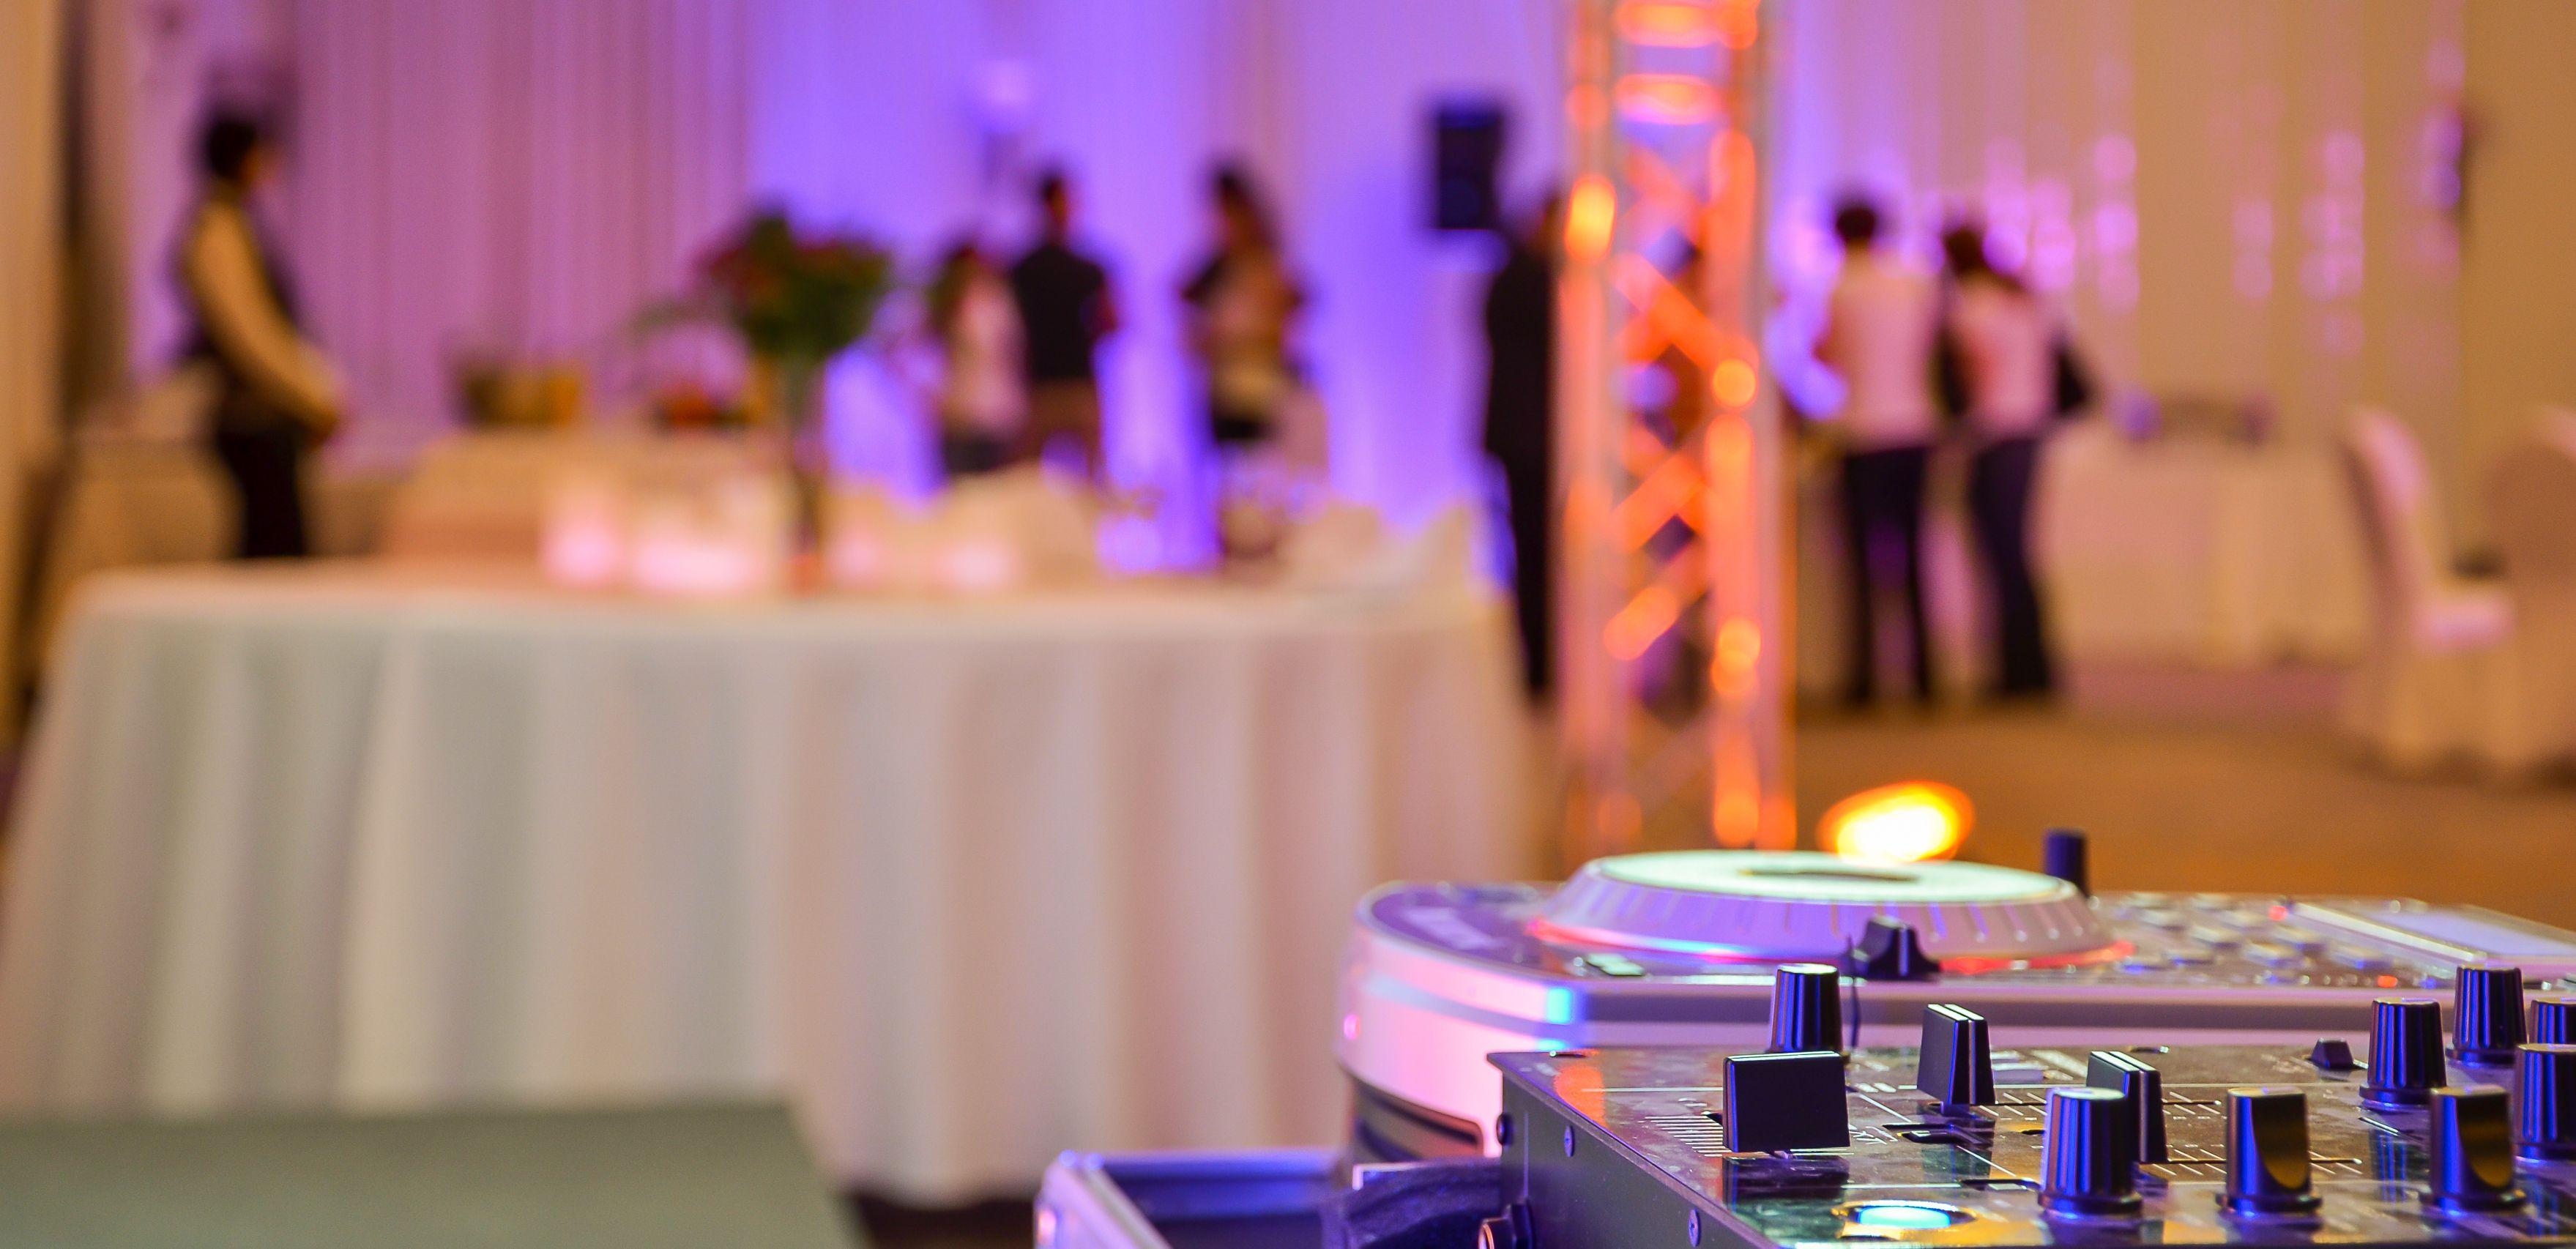 Pin By Auckland Dj Service On Wedding Dj Auckland Wedding Dj Wedding Music Wedding